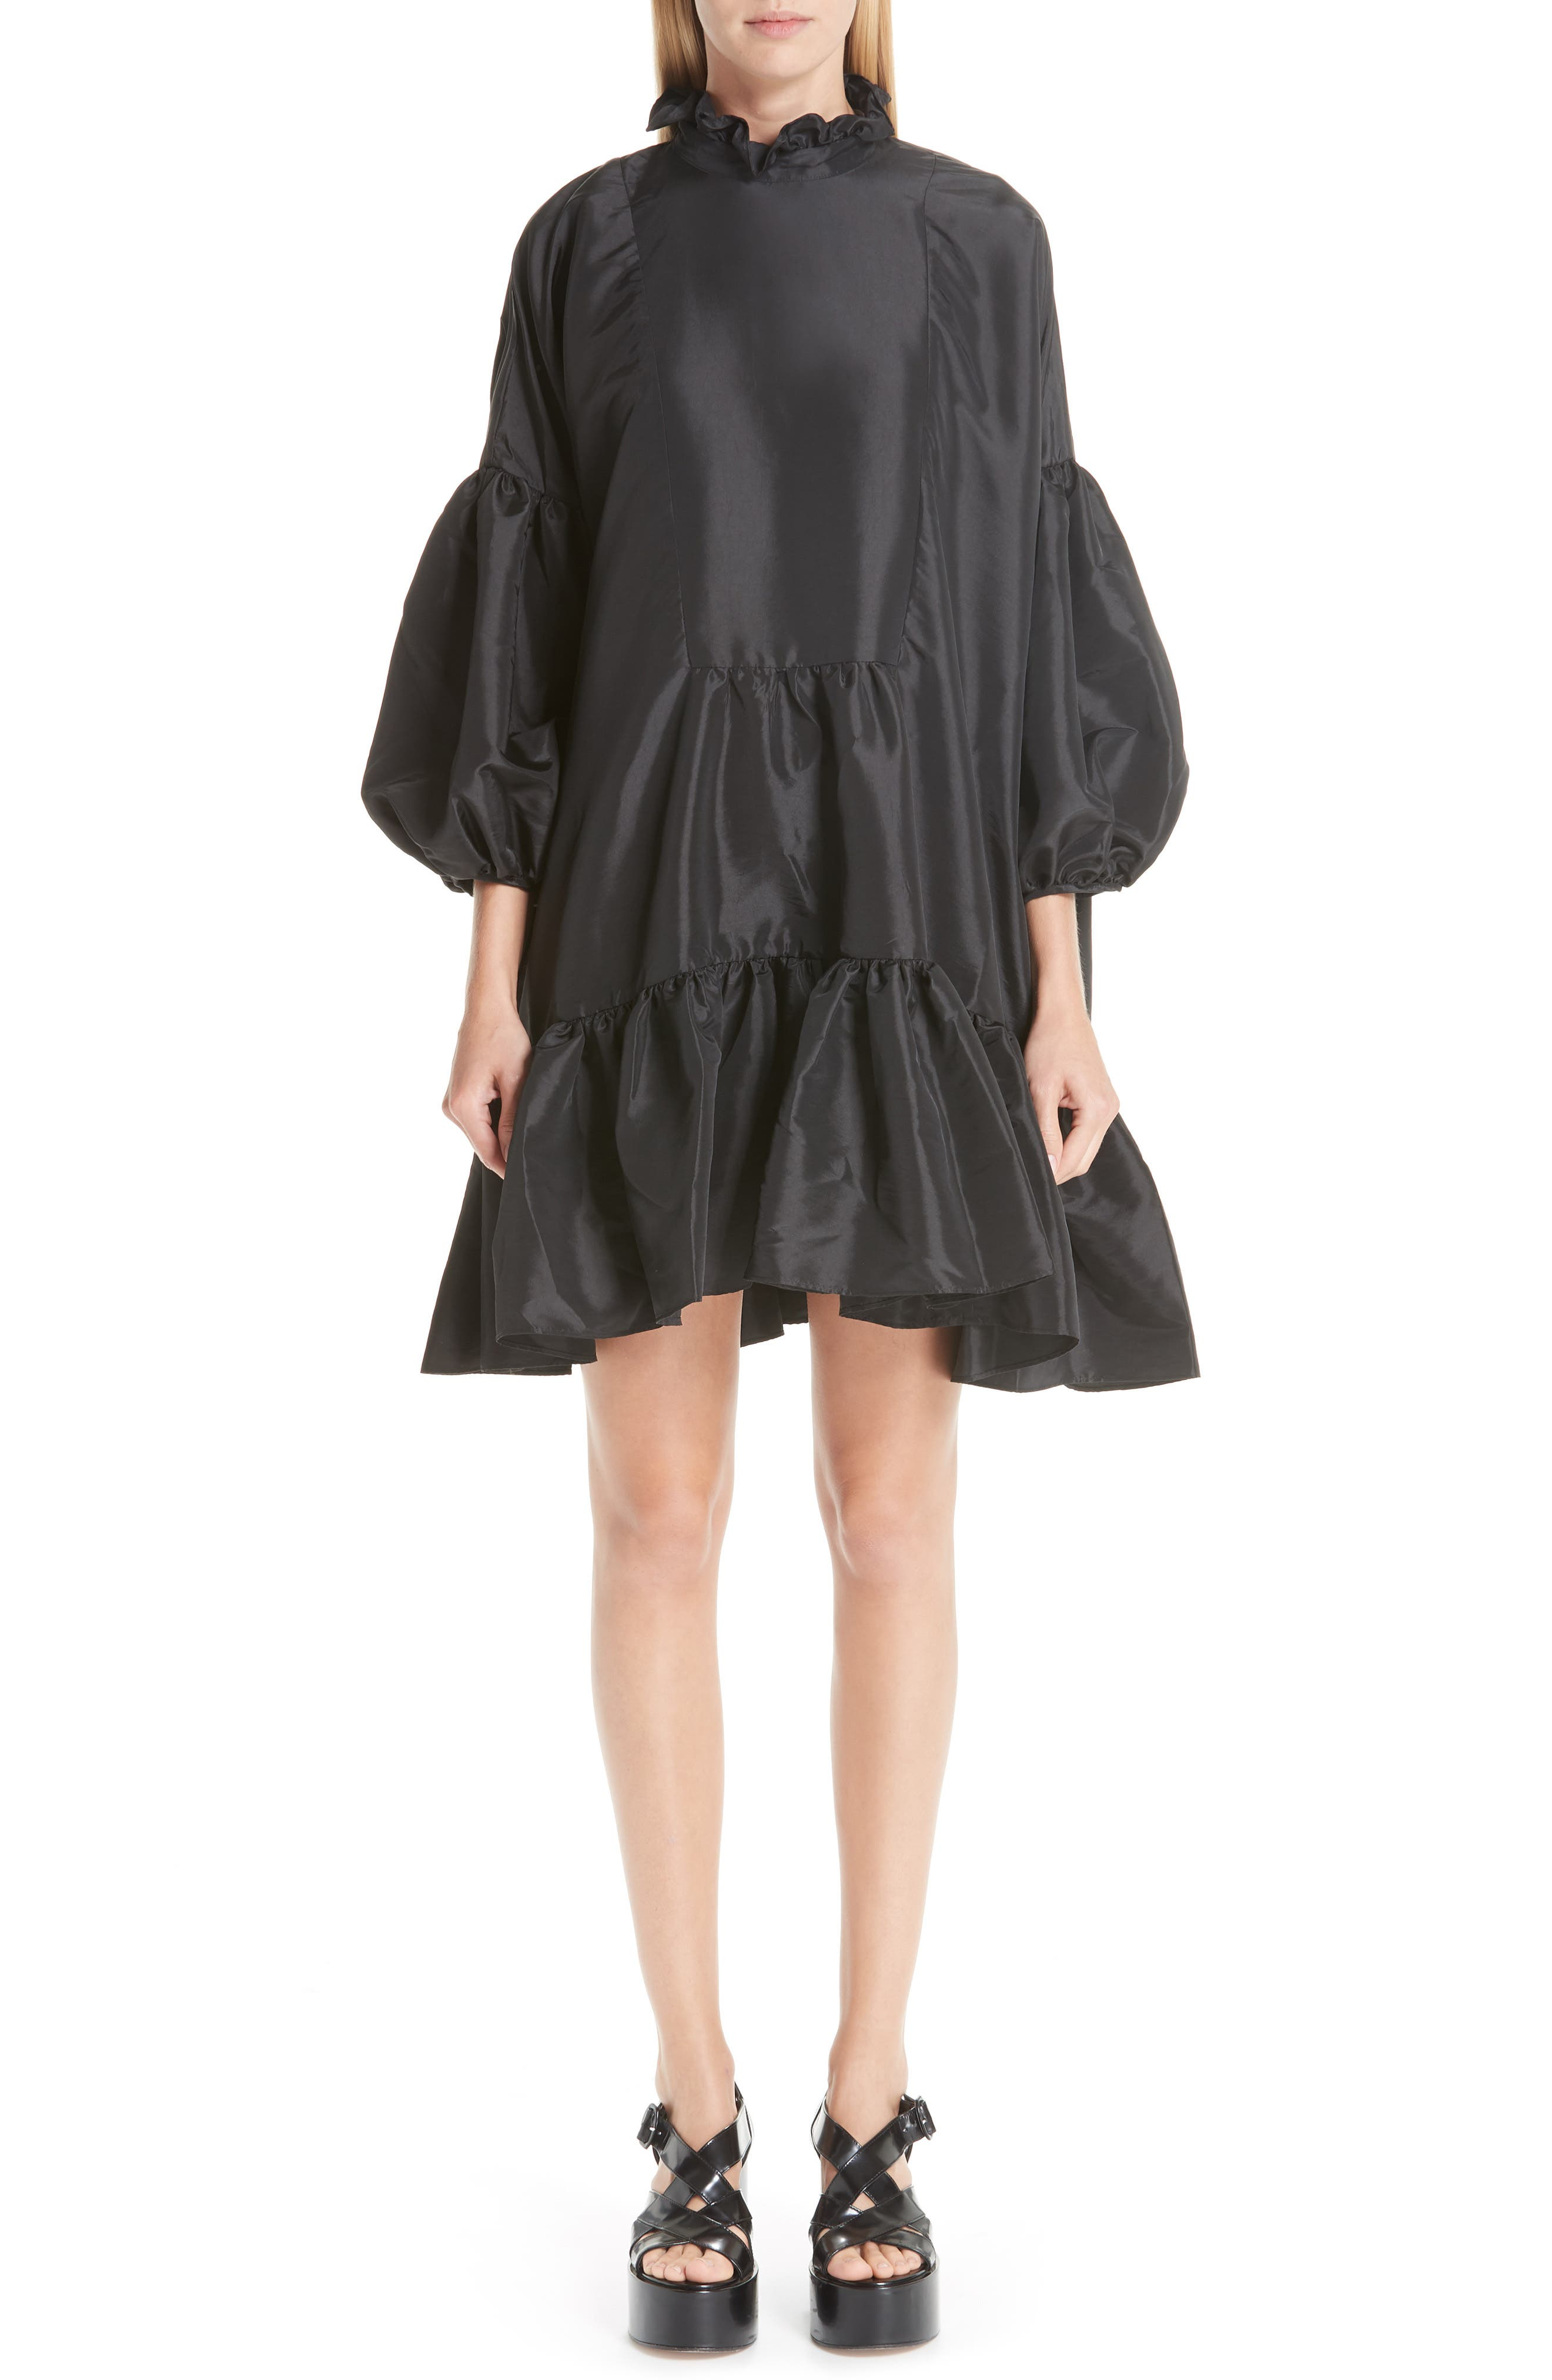 CECILIE BAHNSEN Belle Faille Dress in Black